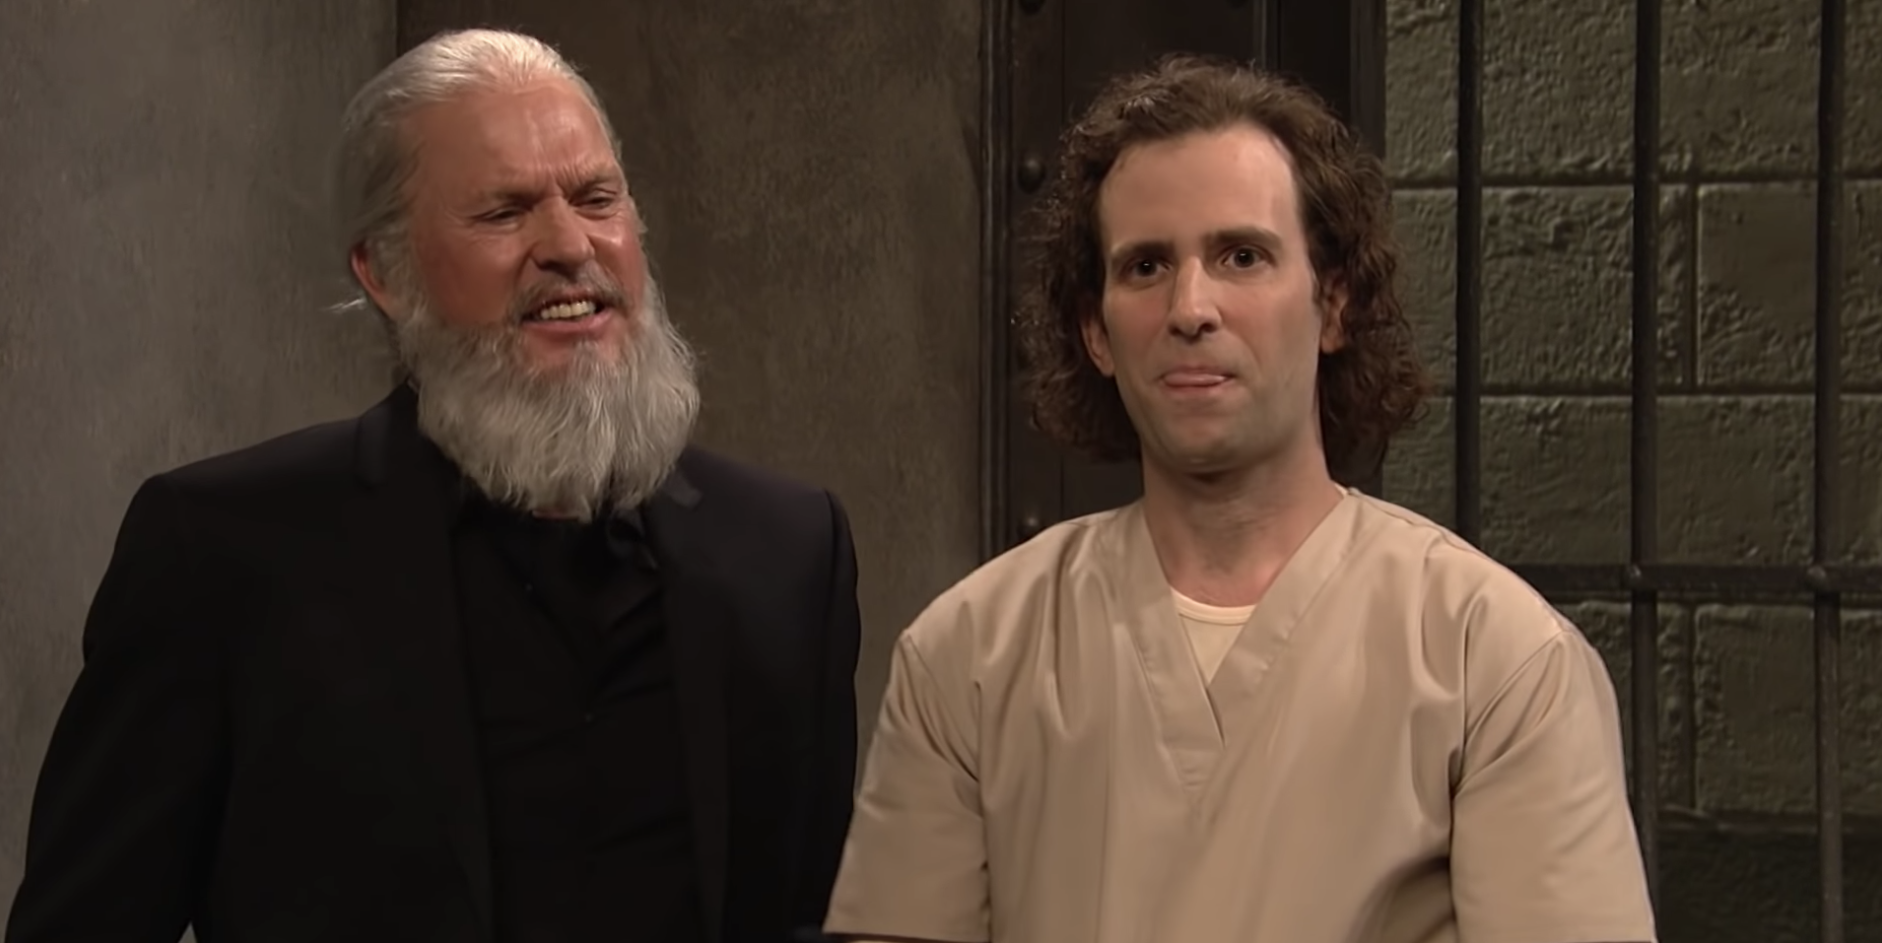 Keaton played Julian Assange, along with Kate McKinnon, who was Lori Loughlin, and Pete Davidson as Michael Avenatti.